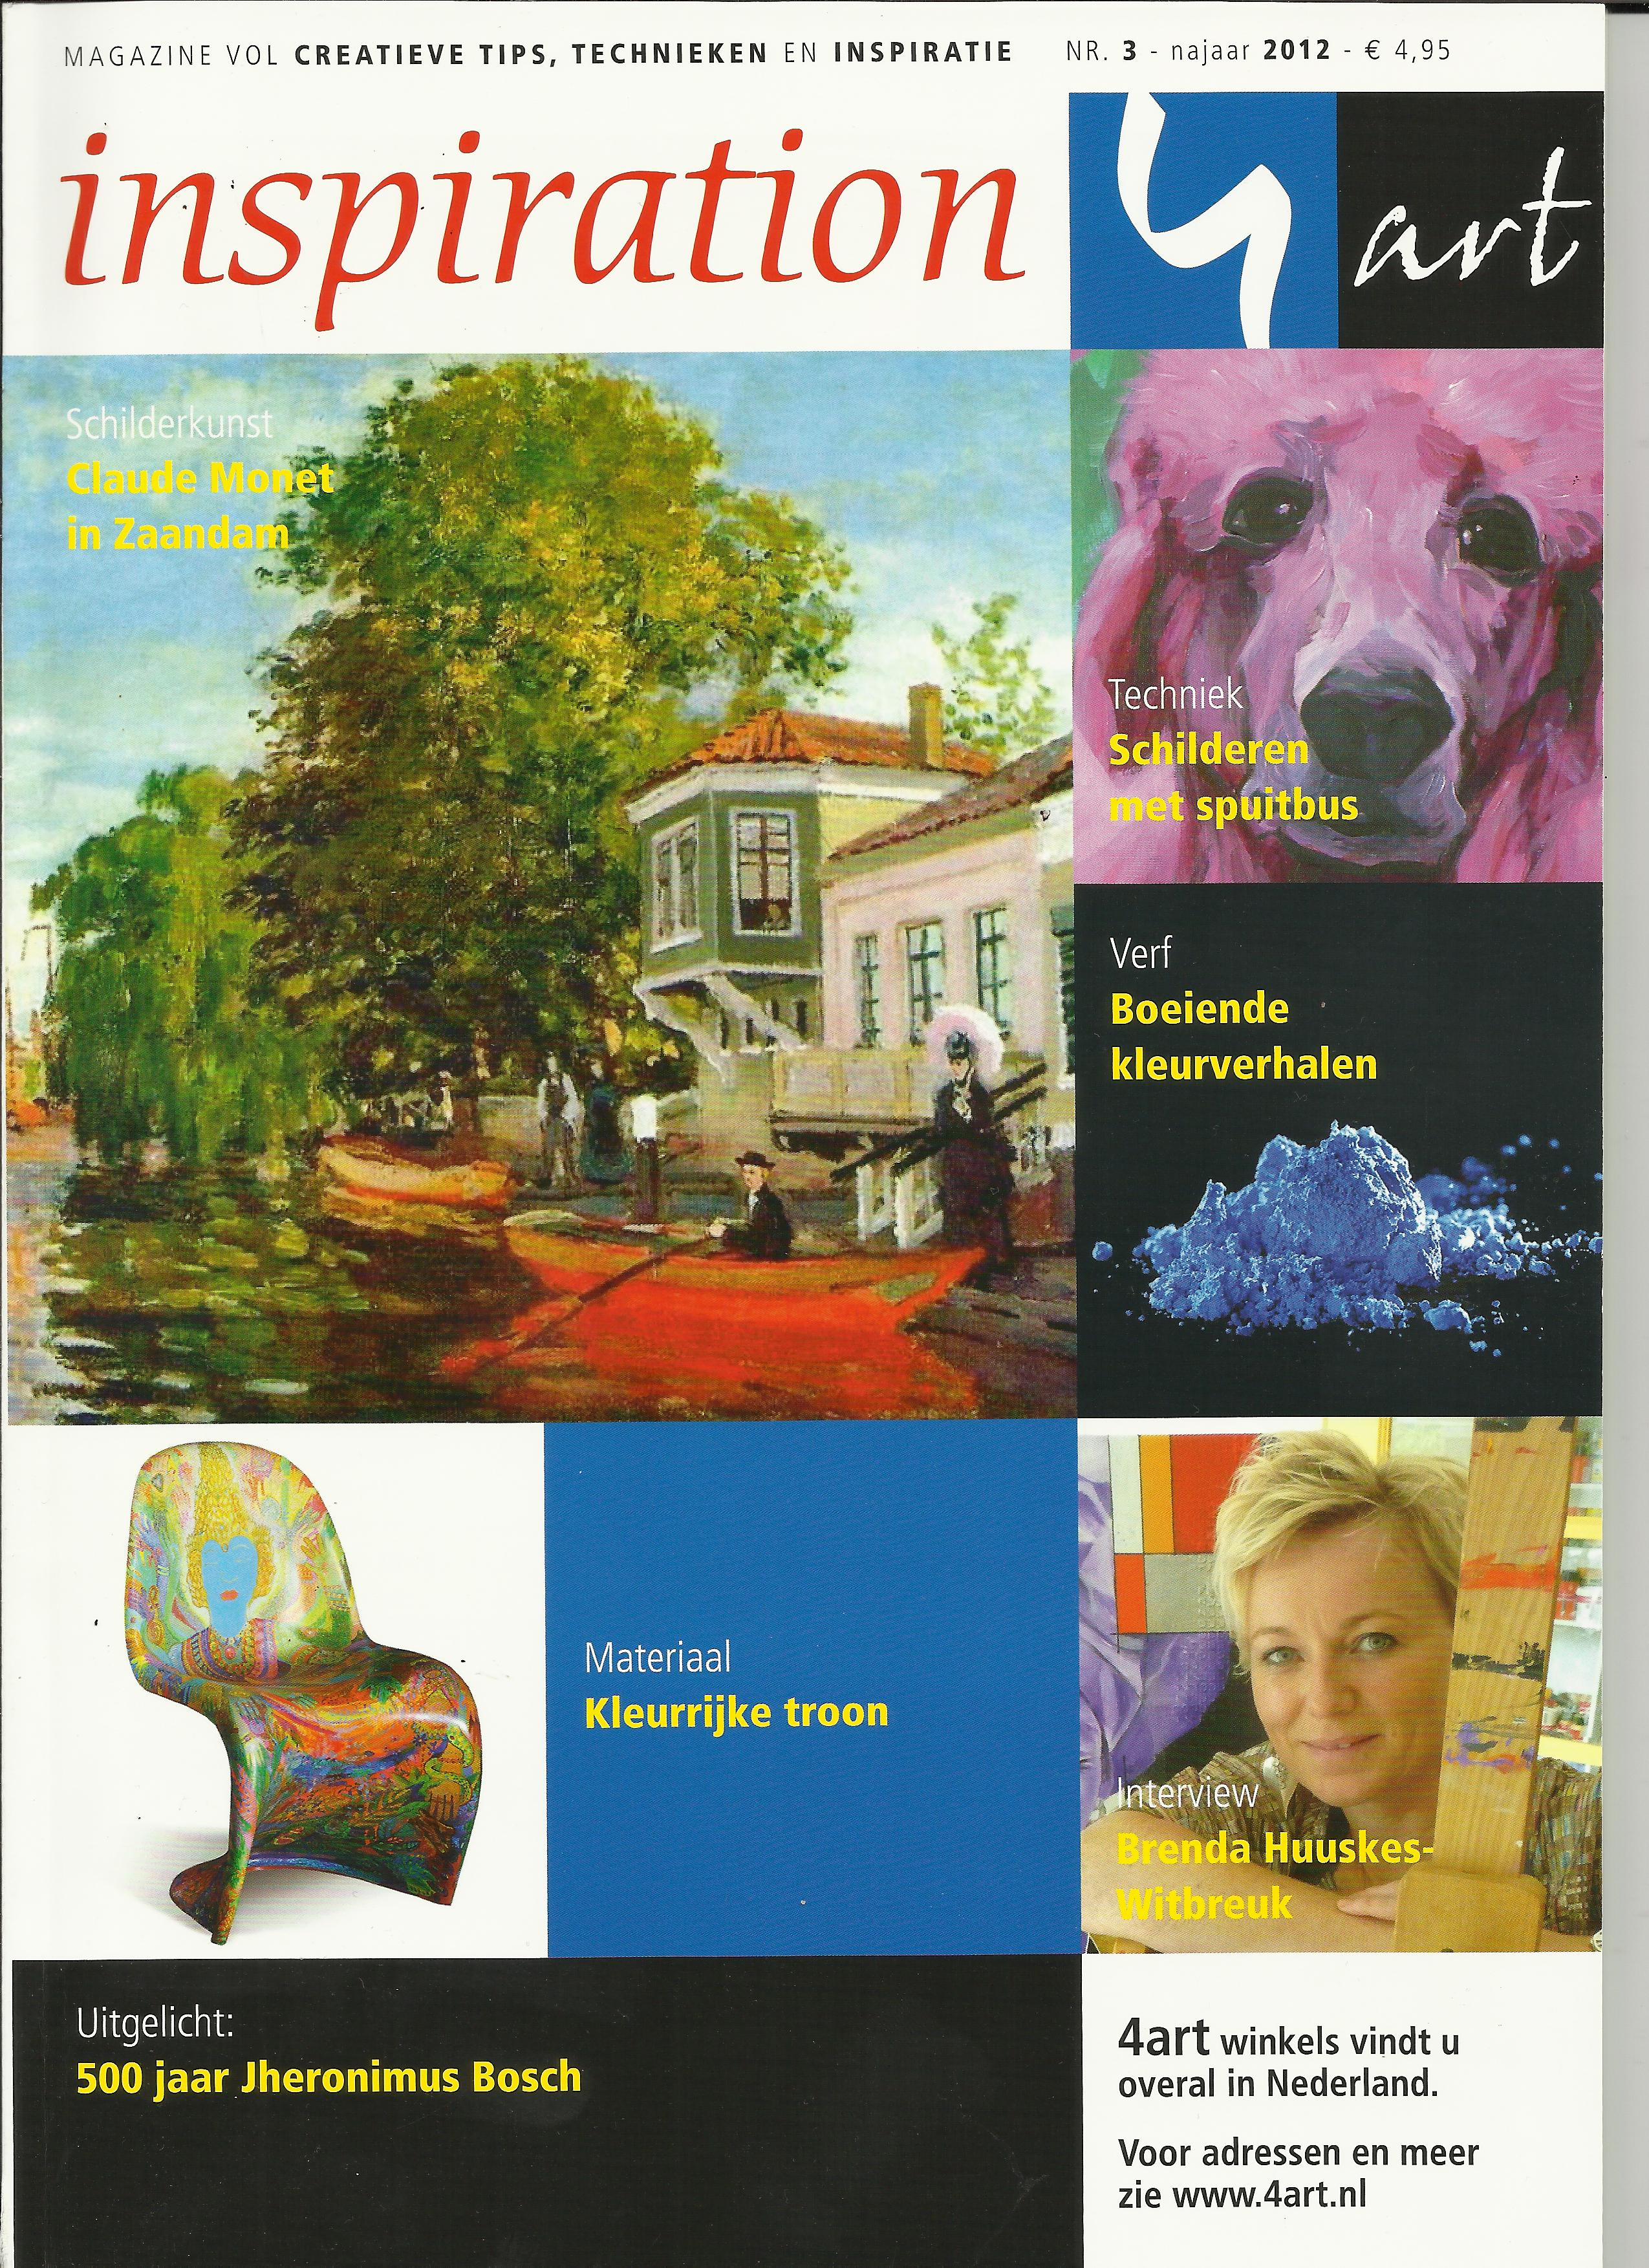 Titelseite des Magazine inspiration art Nr. 3 - najaar 2012 aus Hedel, Holland